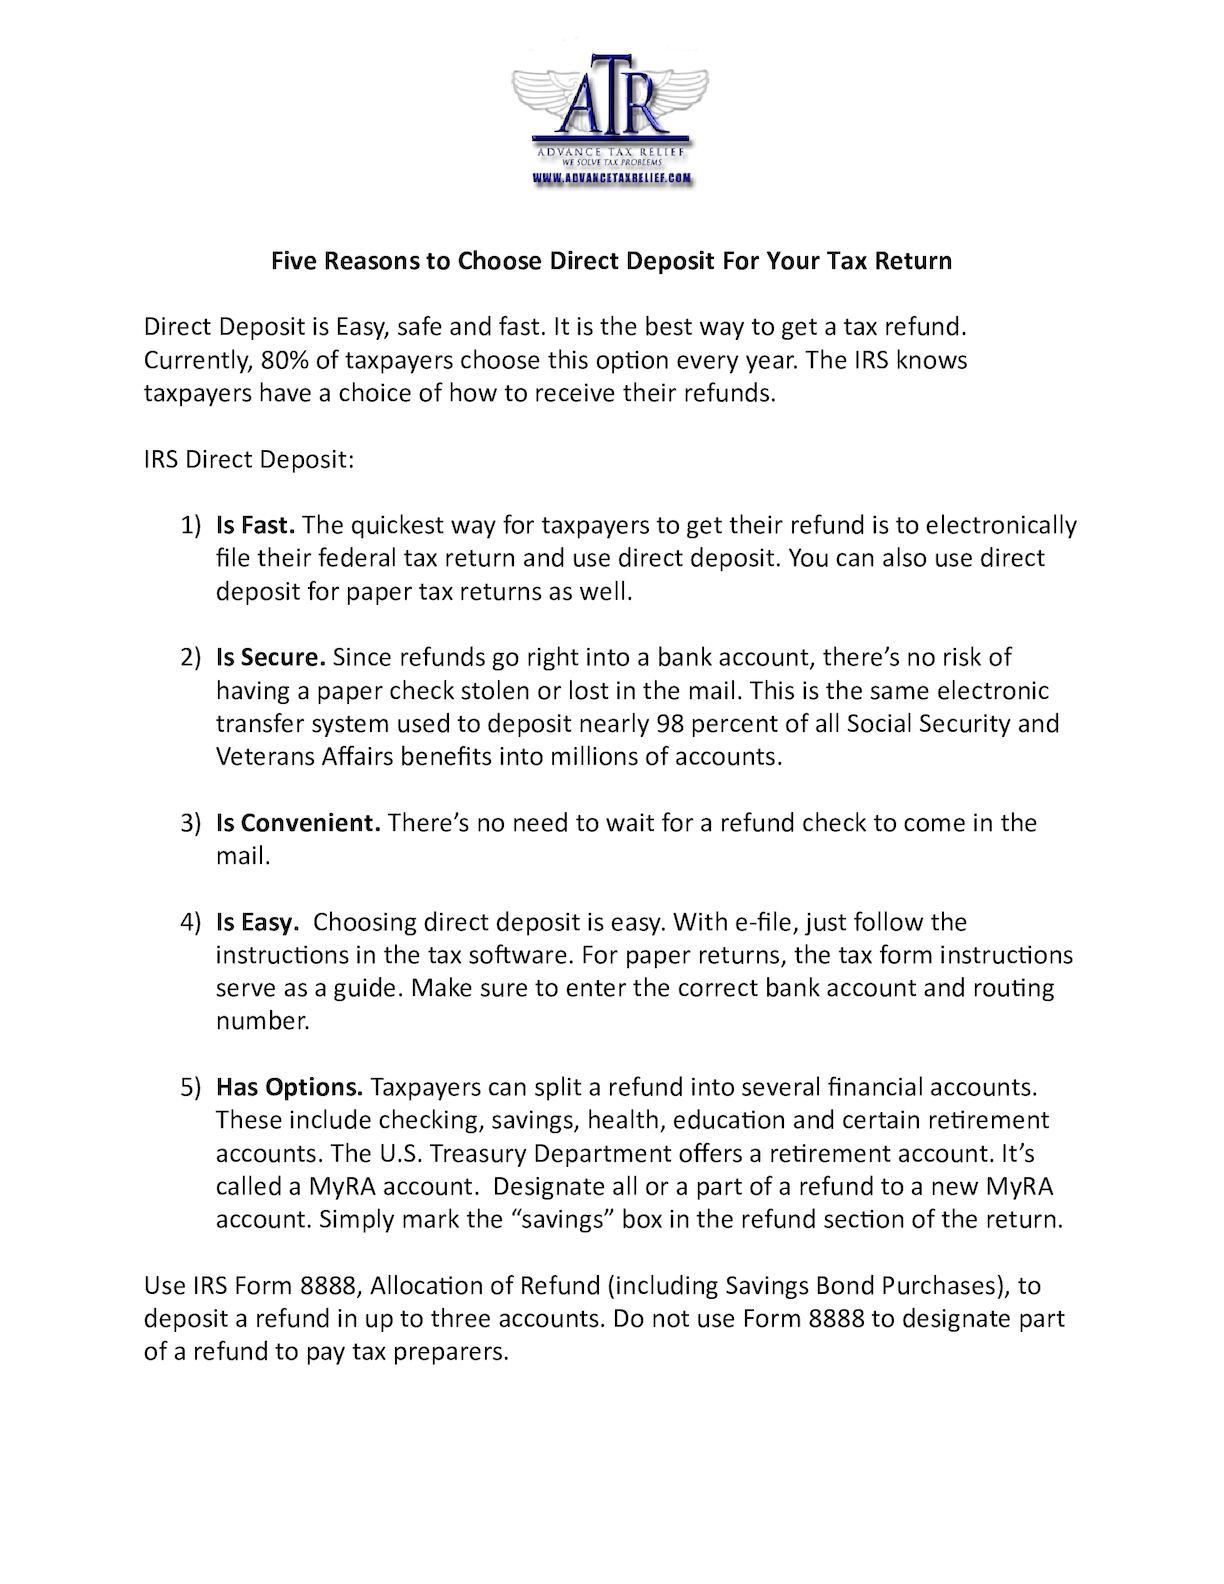 Calaméo - FIVE REASONS TO CHOOSE DIRECT DEPOSIT